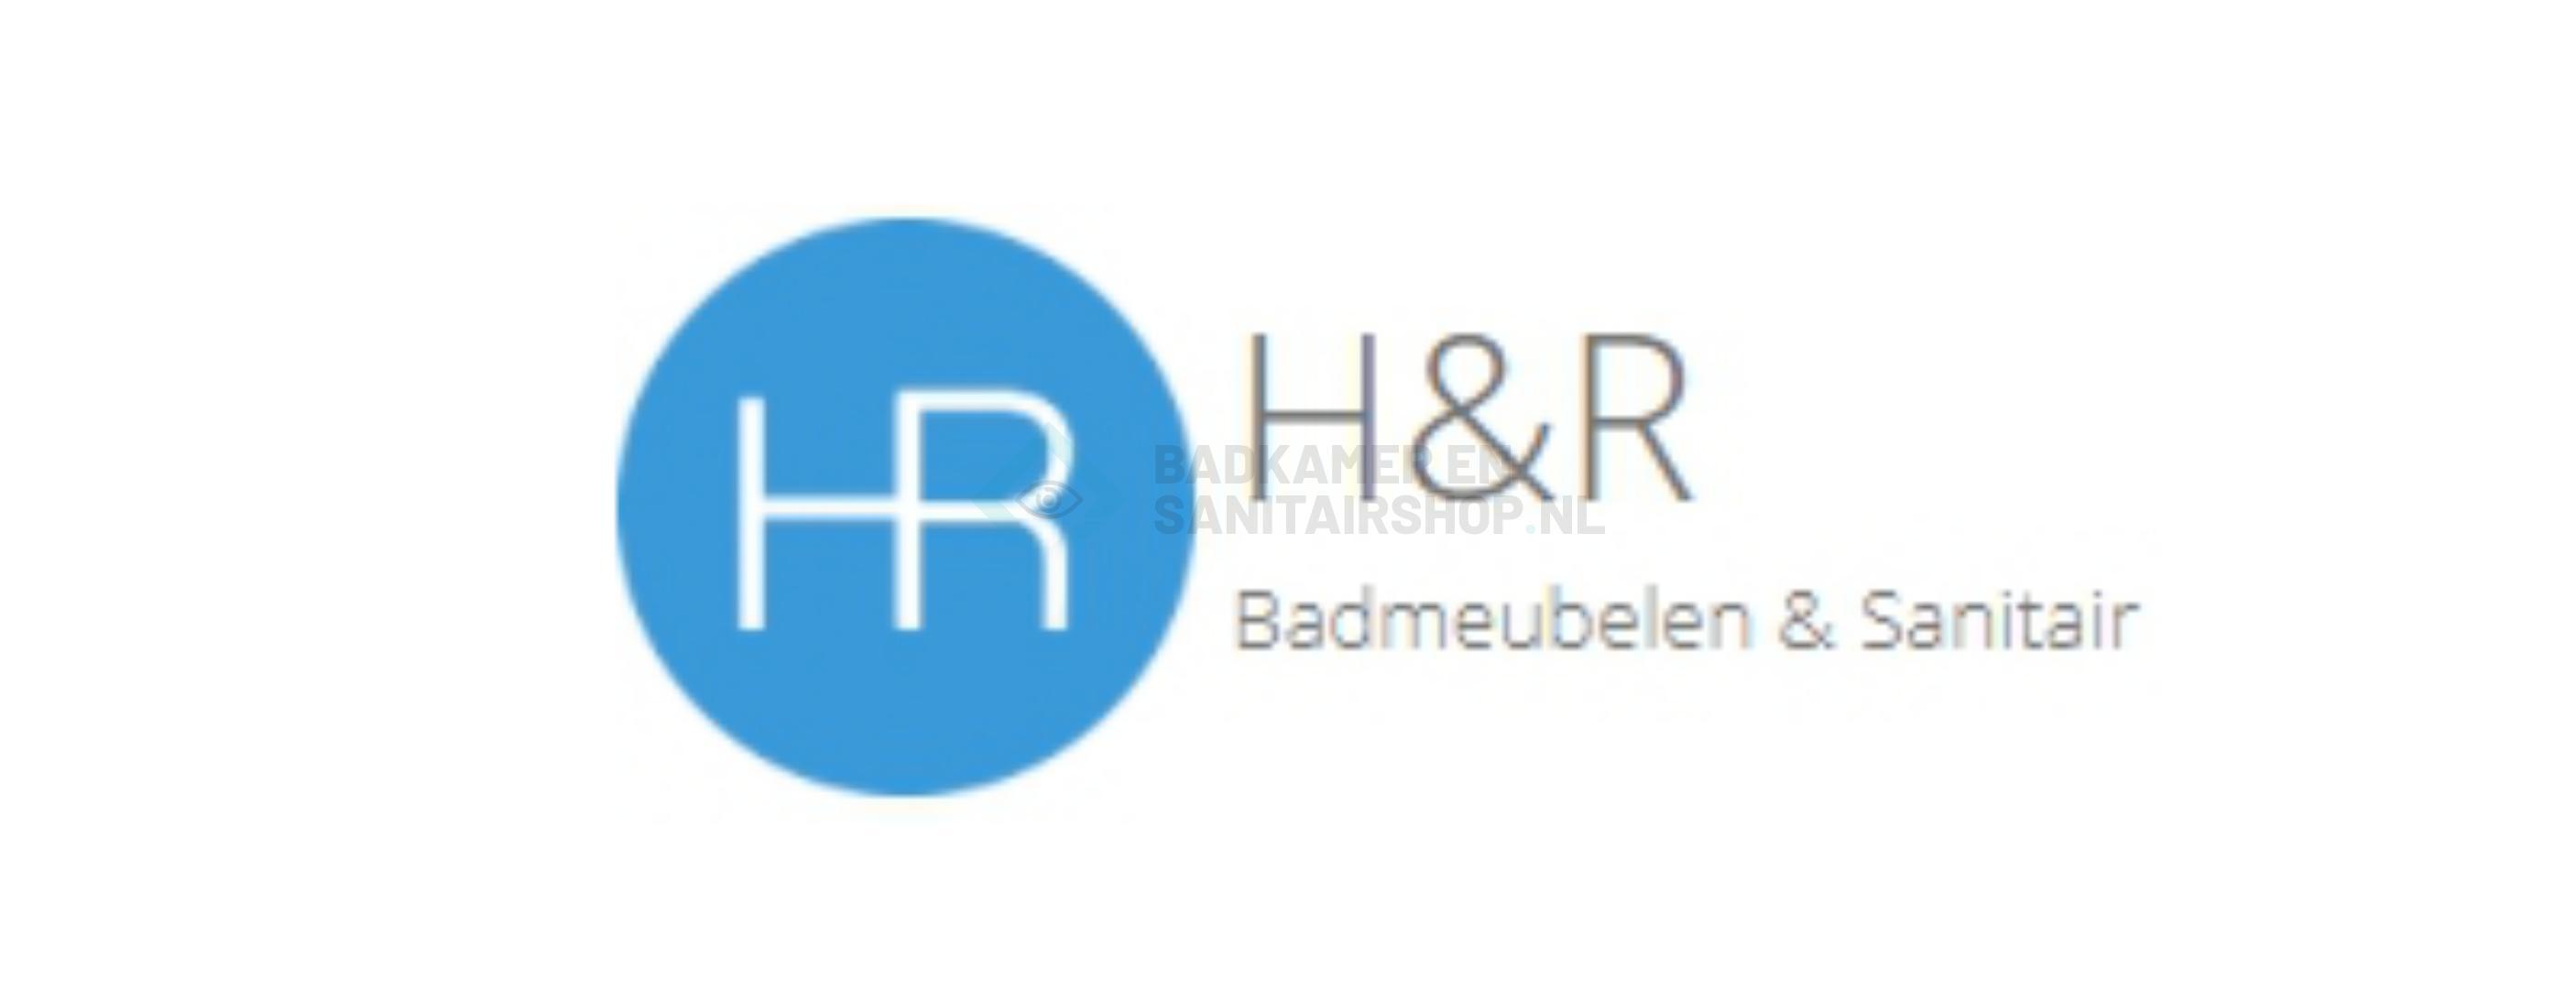 H&R badmeubelen